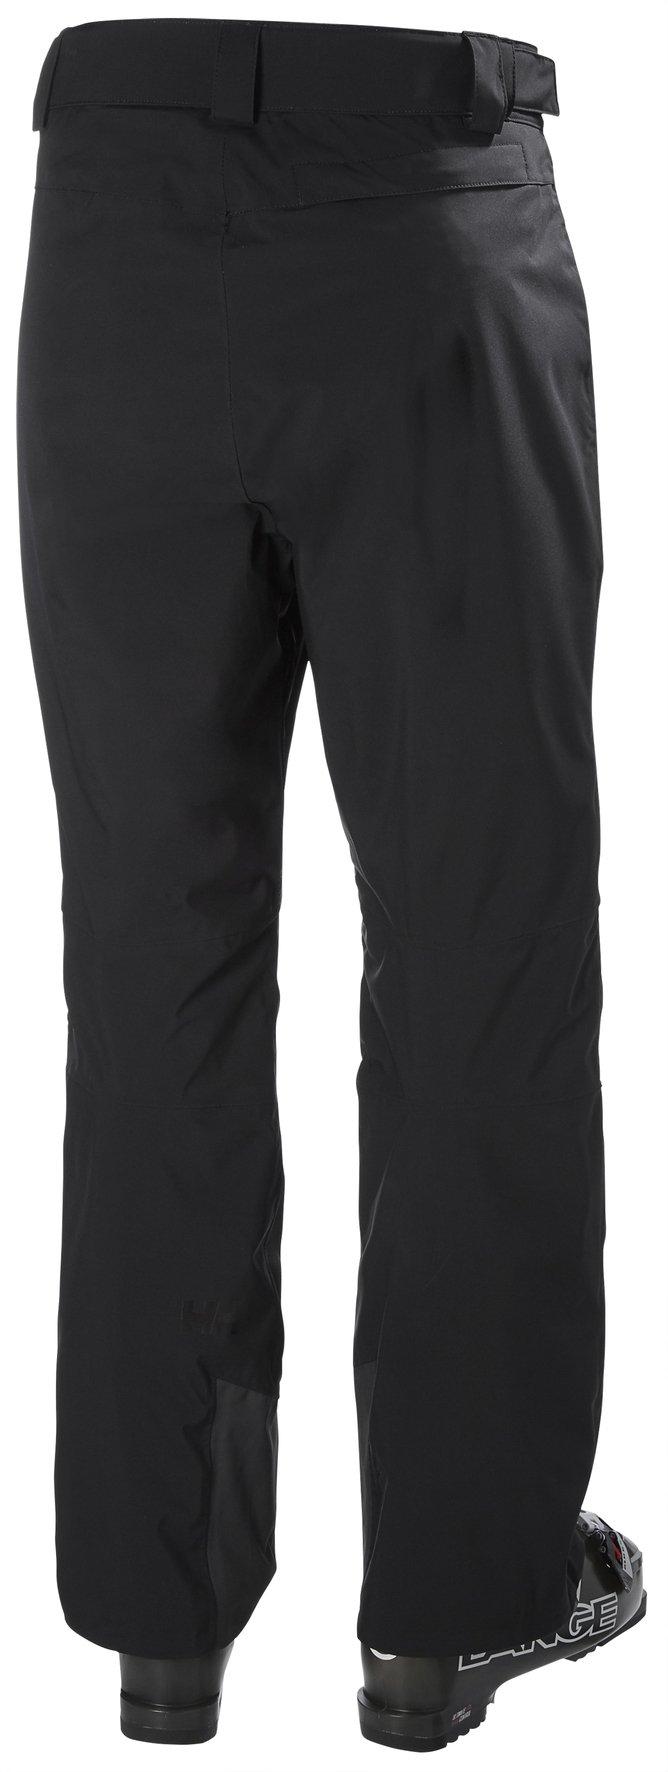 Image 1 of HELLY HANSEN - LEGENDARY SHORT PANT, Black 2XL only